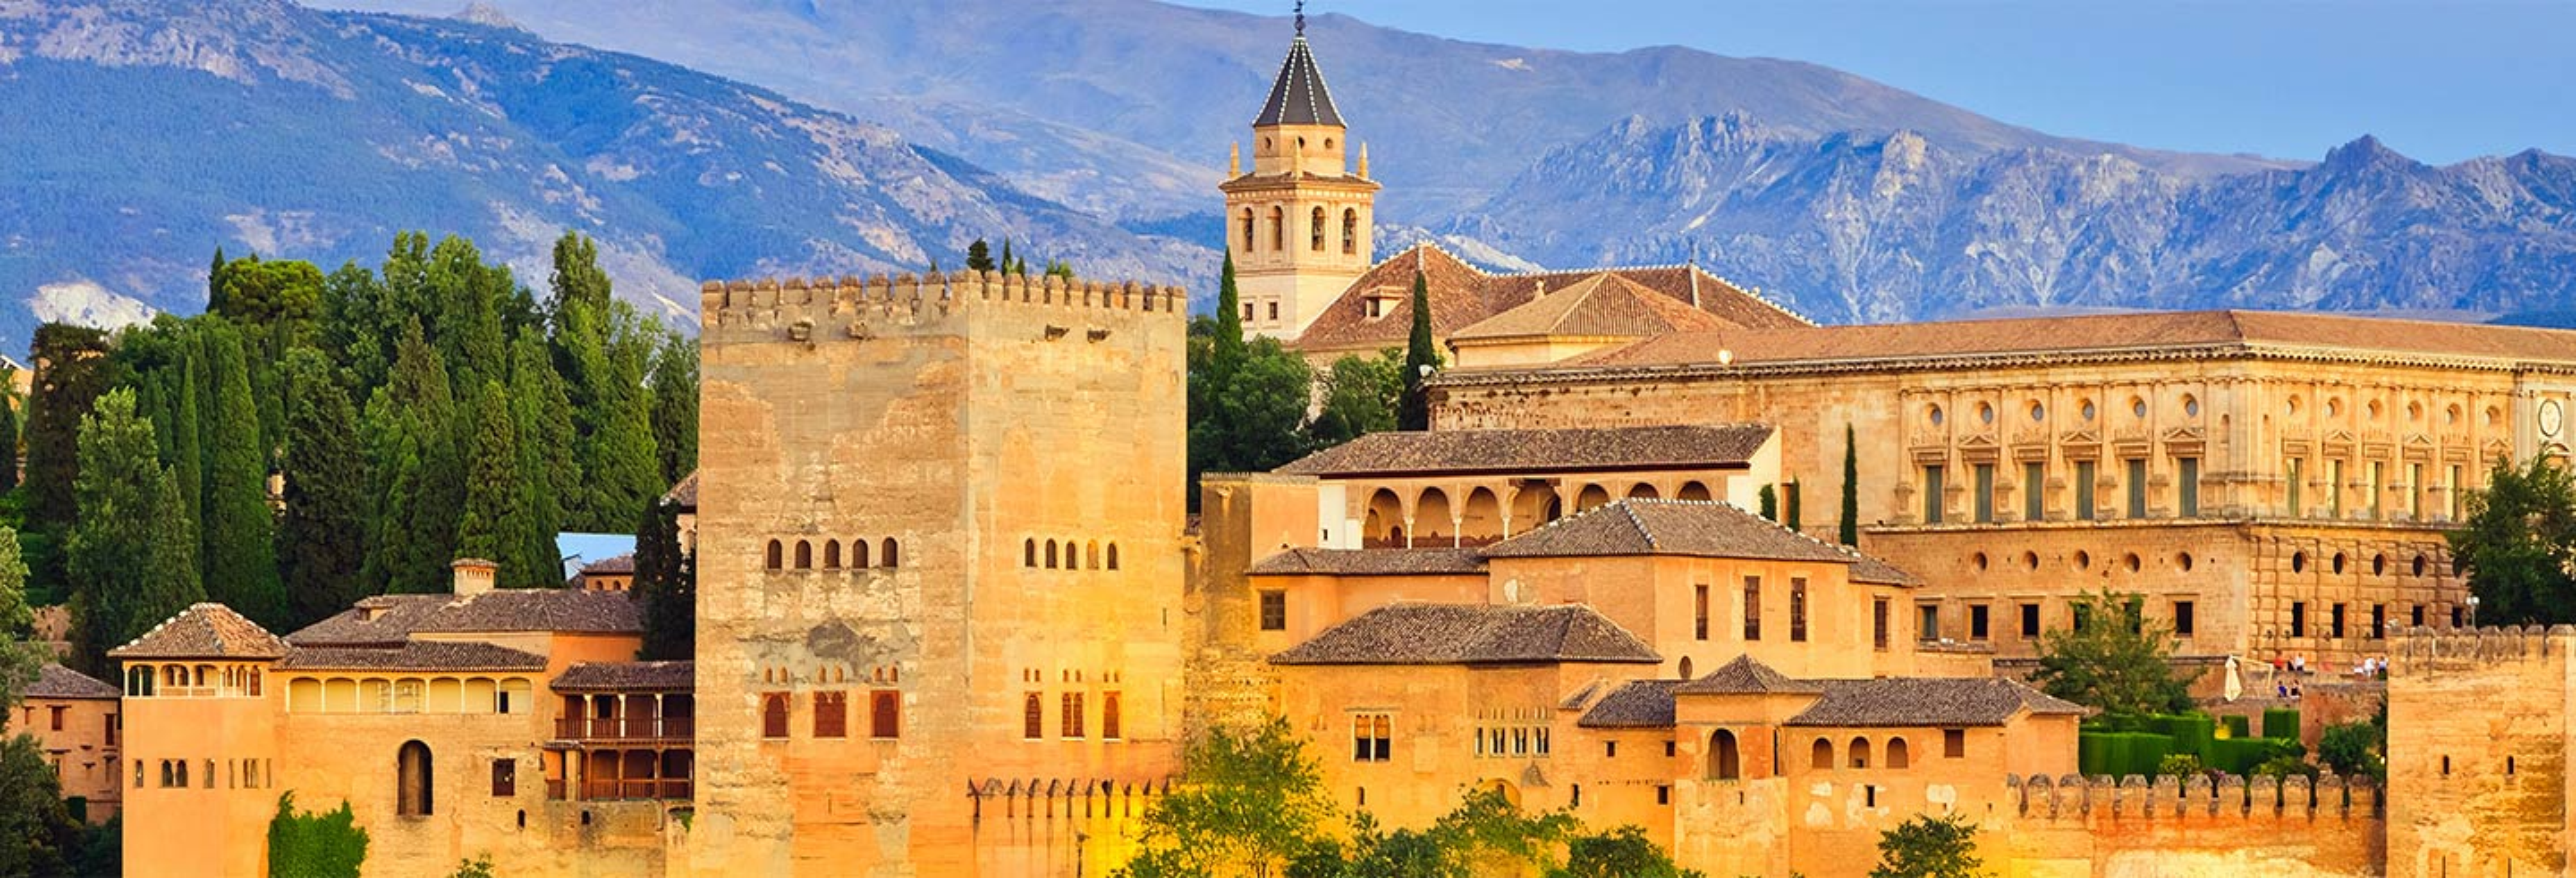 Alhambra & Generalife Tour